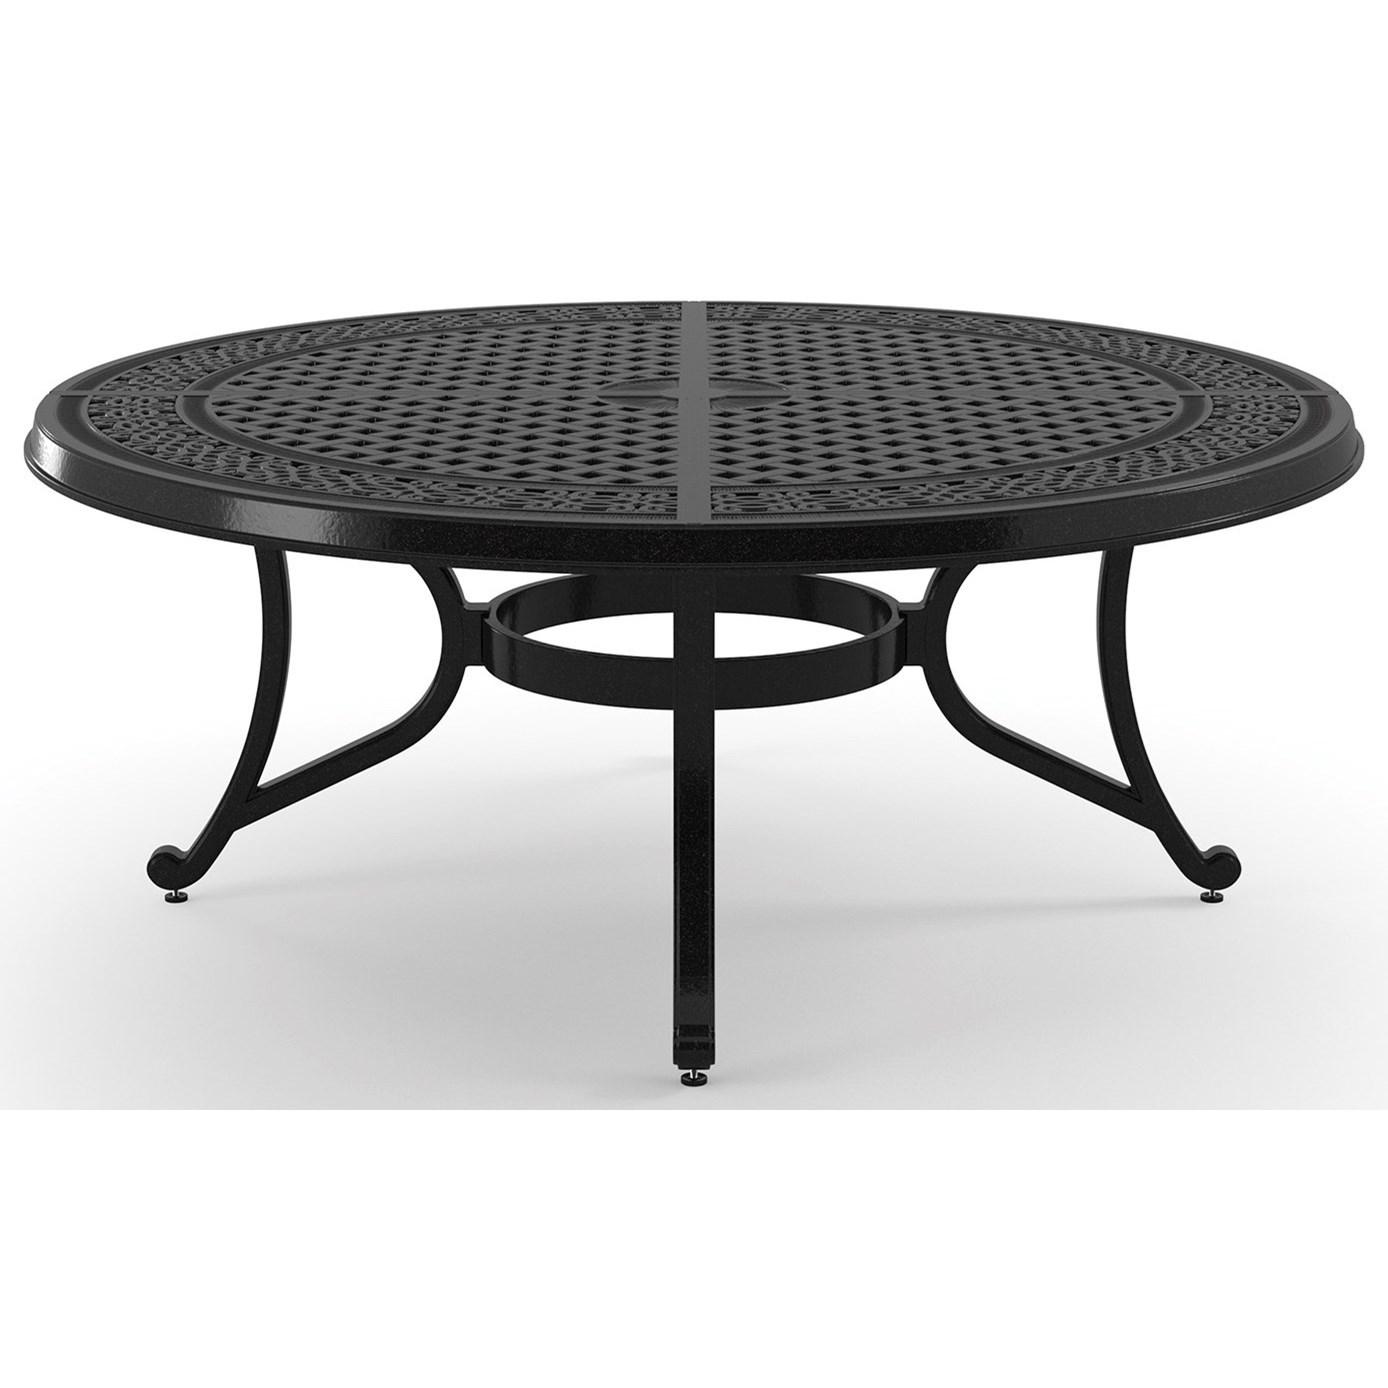 signature design by ashley burnella round metal cocktail table royal furniture outdoor. Black Bedroom Furniture Sets. Home Design Ideas